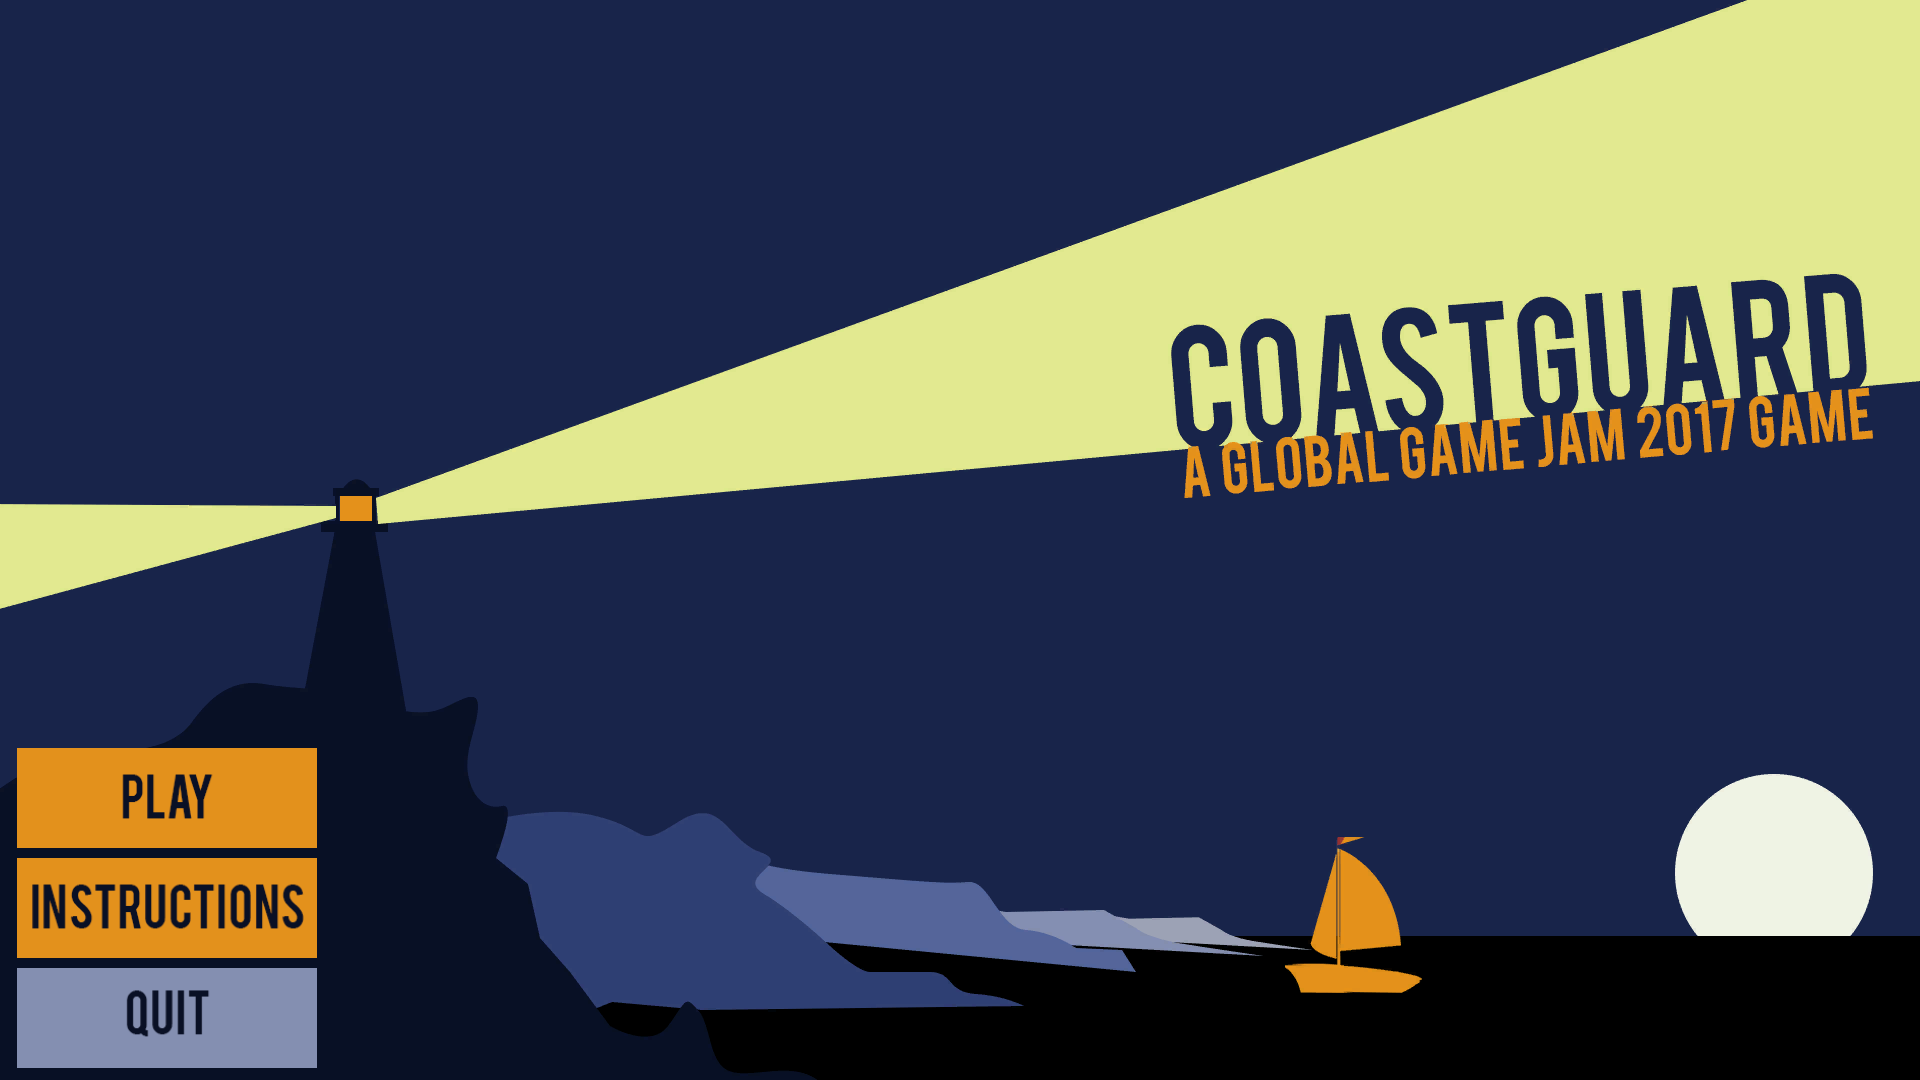 Coastguard Catastrophe